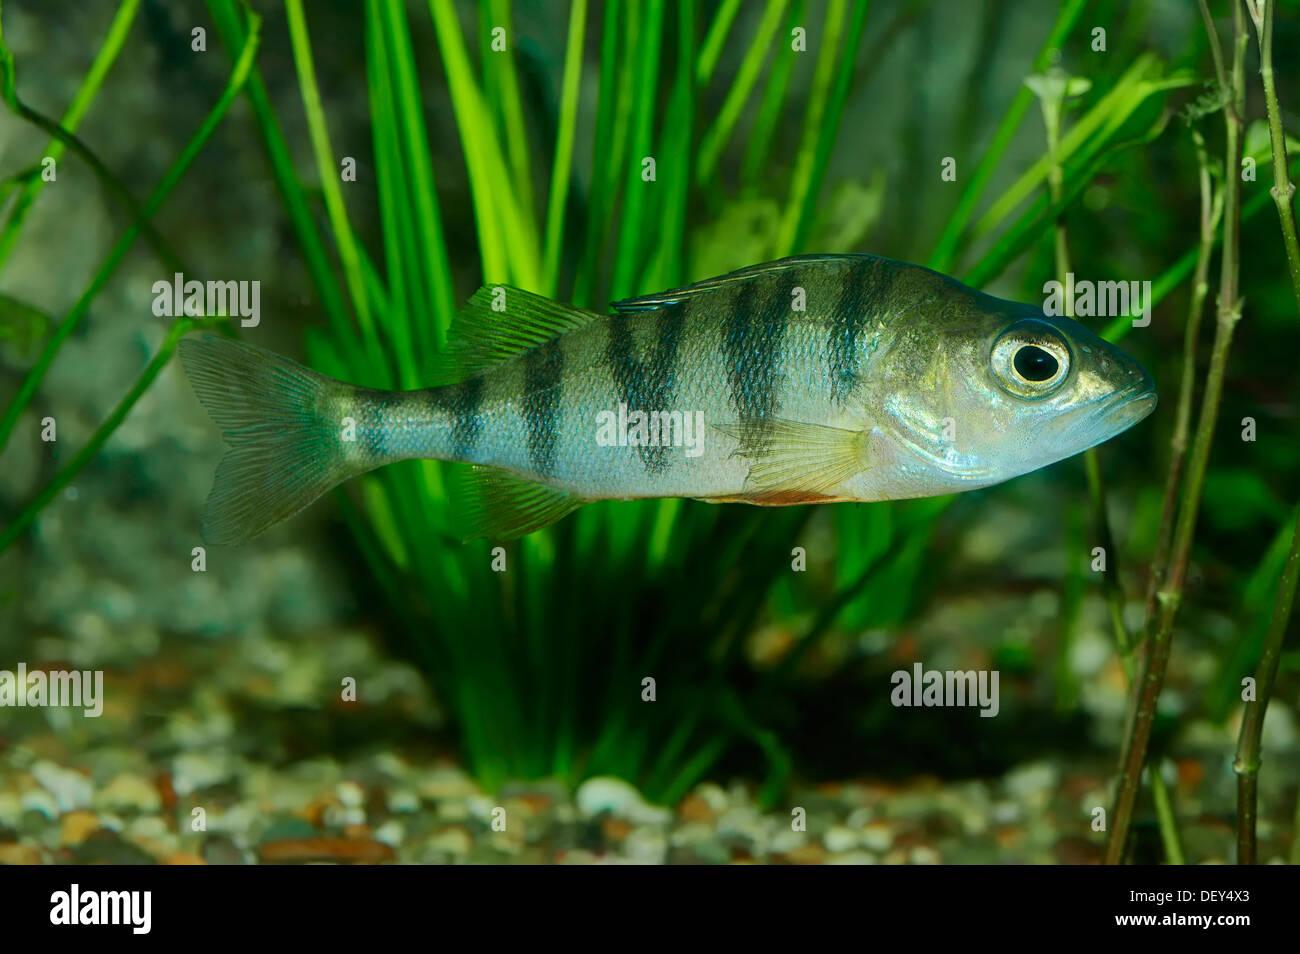 Freshwater juvenile fish - European Perch Perca Fluviatilis Freshwater Fish Native To Europe Captive